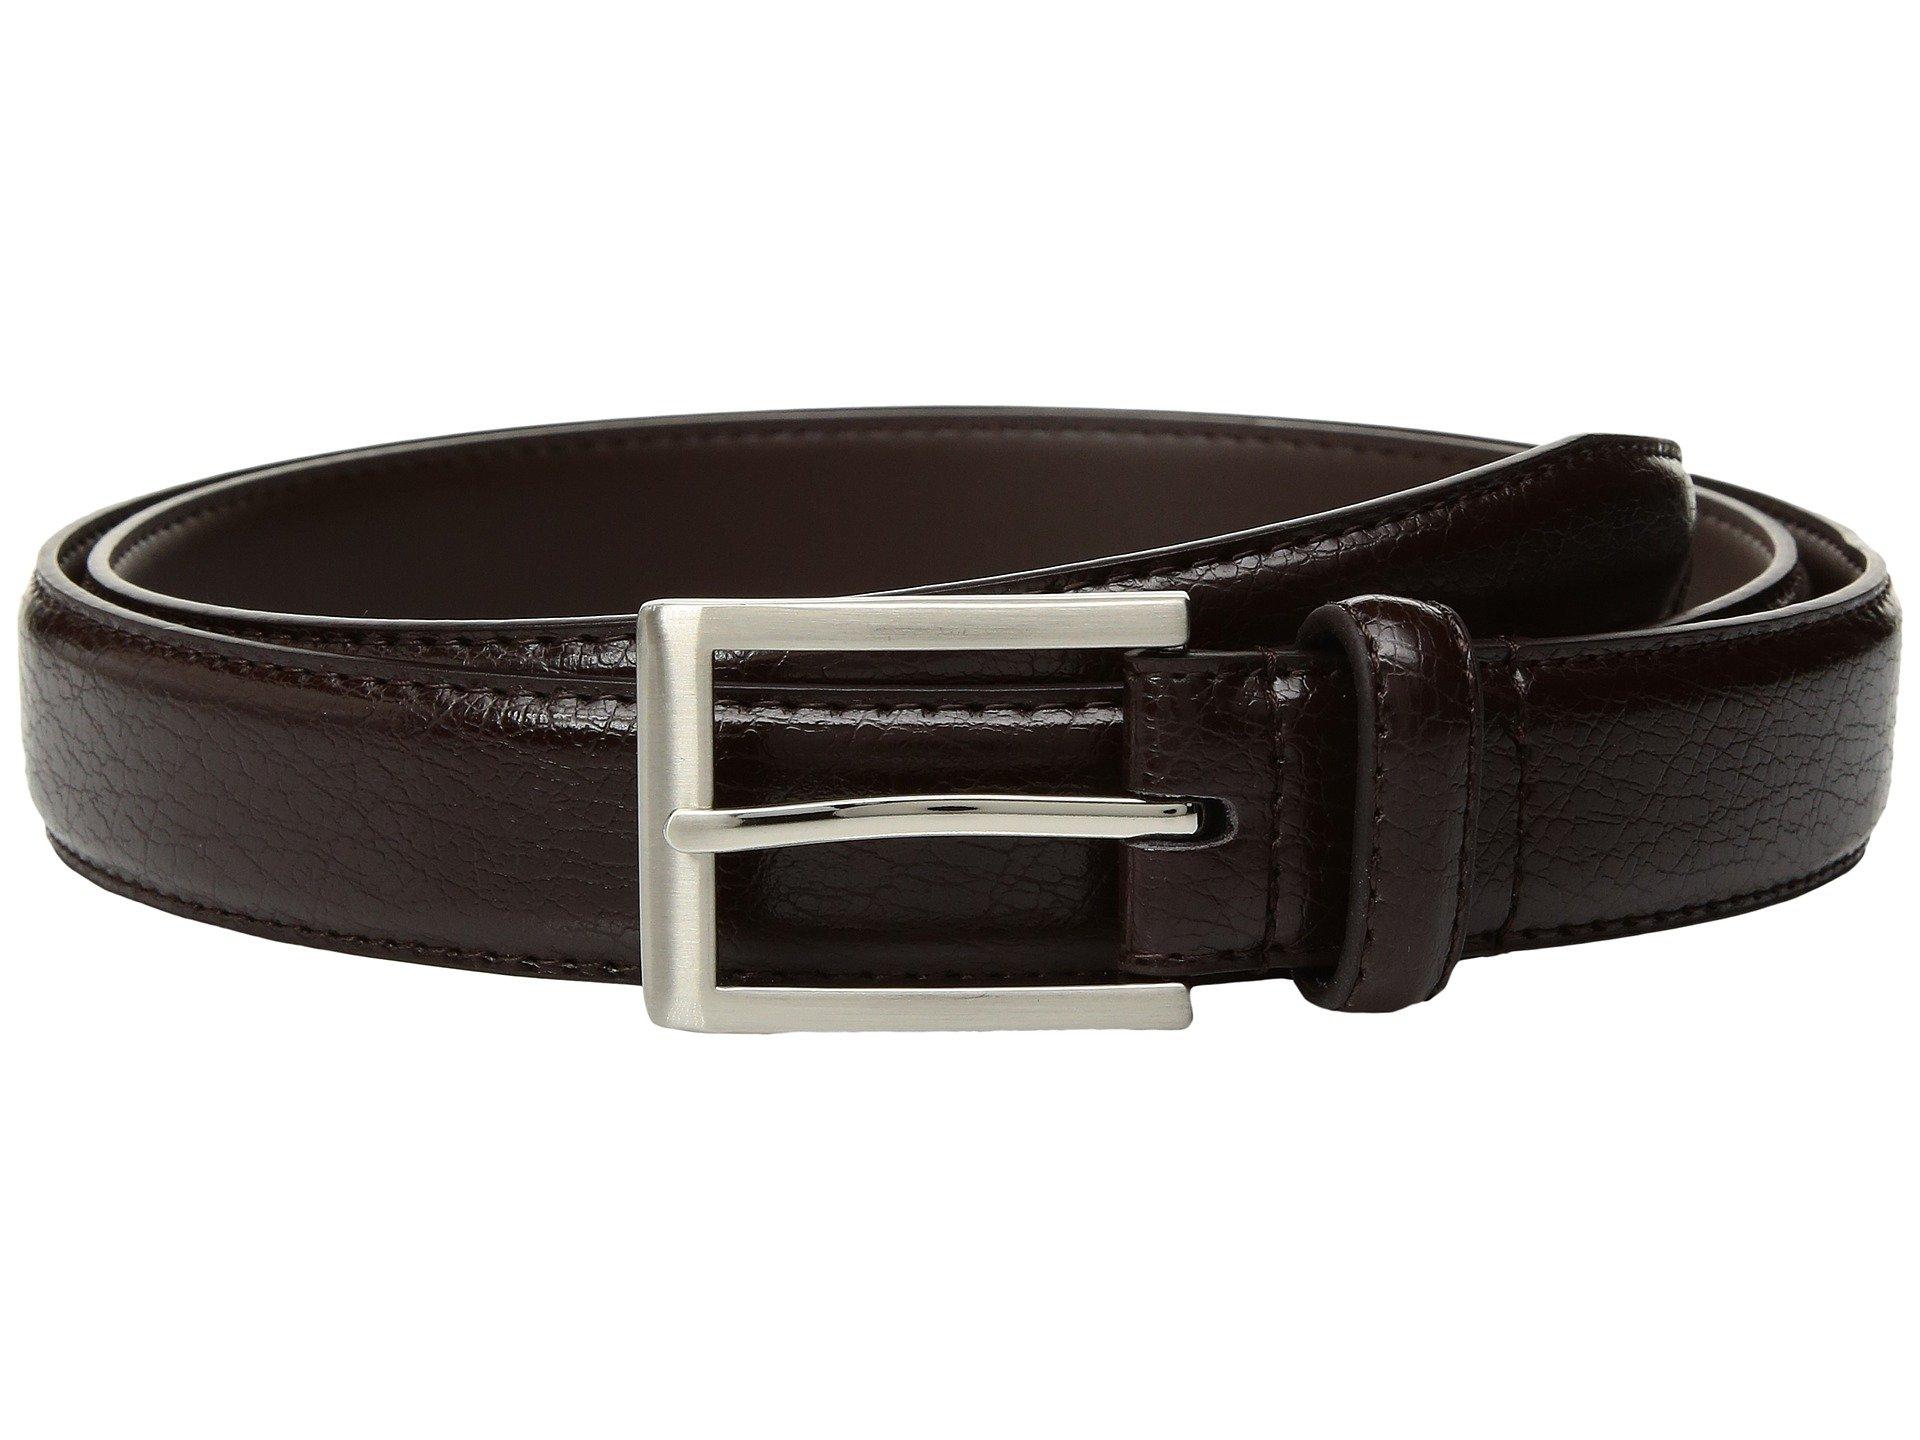 Correa o Cinturon para Hombre Florsheim Crackle Grain Belt  + Florsheim en VeoyCompro.net